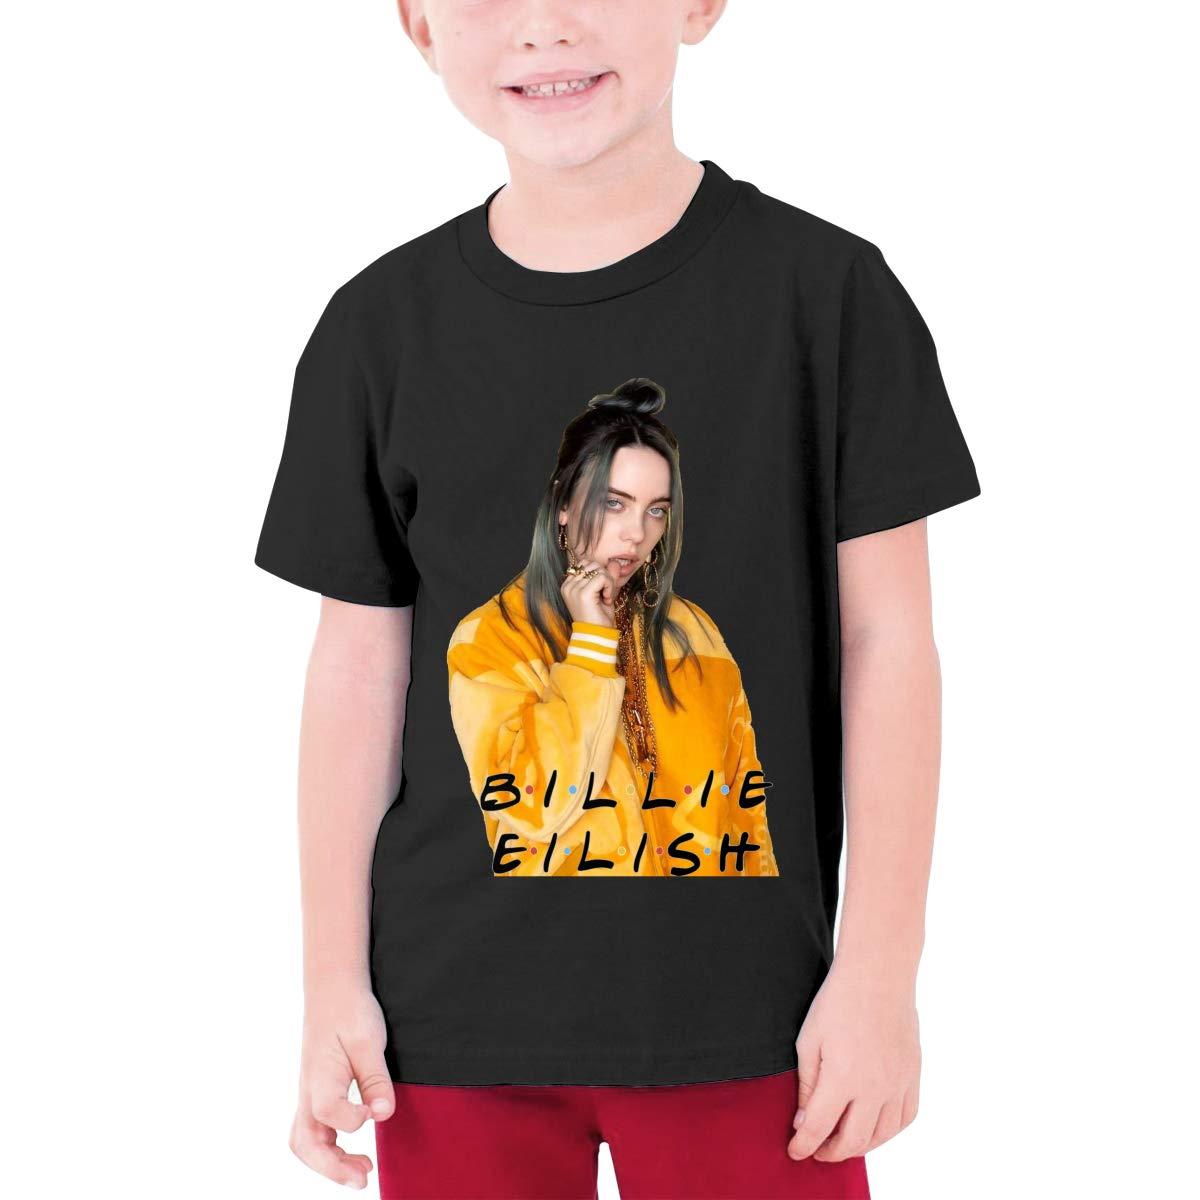 Qq7 Lcwbc Store Billie Eilish Boysgirls Short Sleeve Youth Kids Top S Nage Shirts